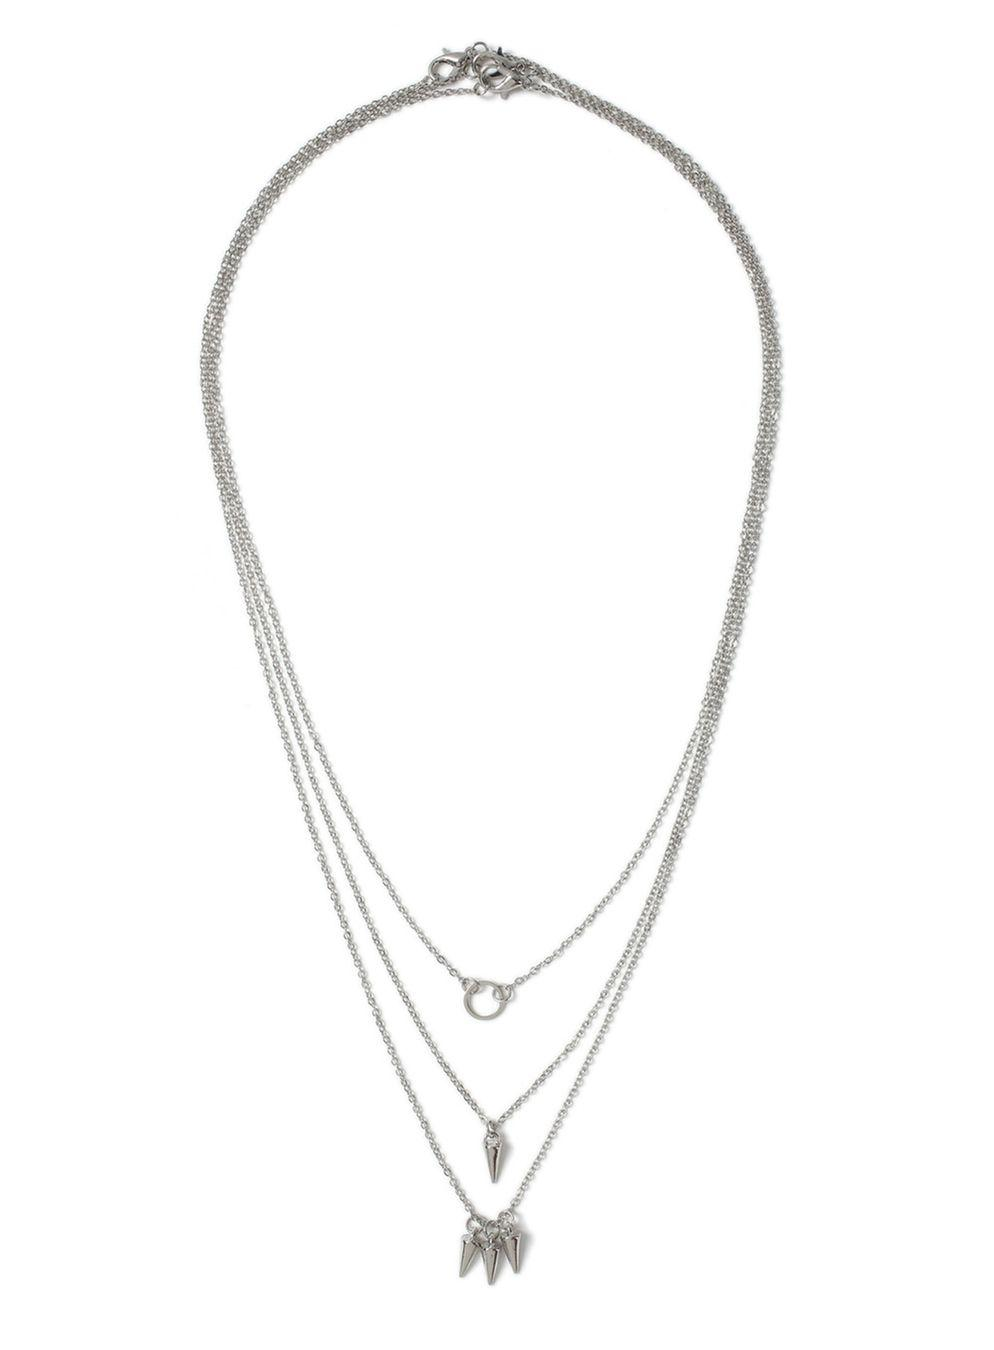 TOPMAN Ilver Tusk Necklace in Metallic for Men